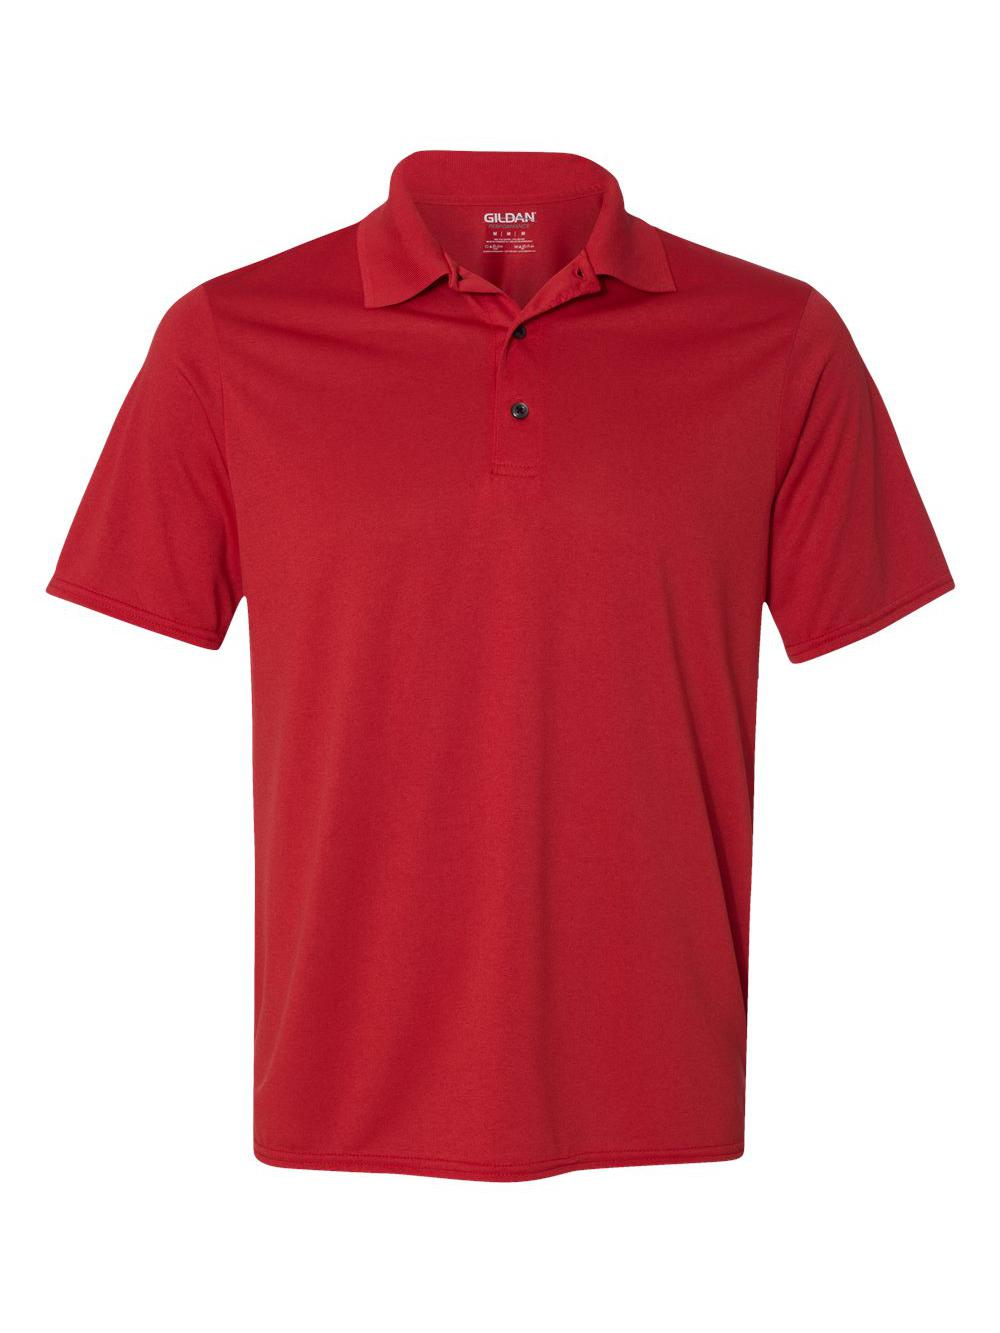 Gildan-Performance-Jersey-Sport-Shirt-44800 thumbnail 21